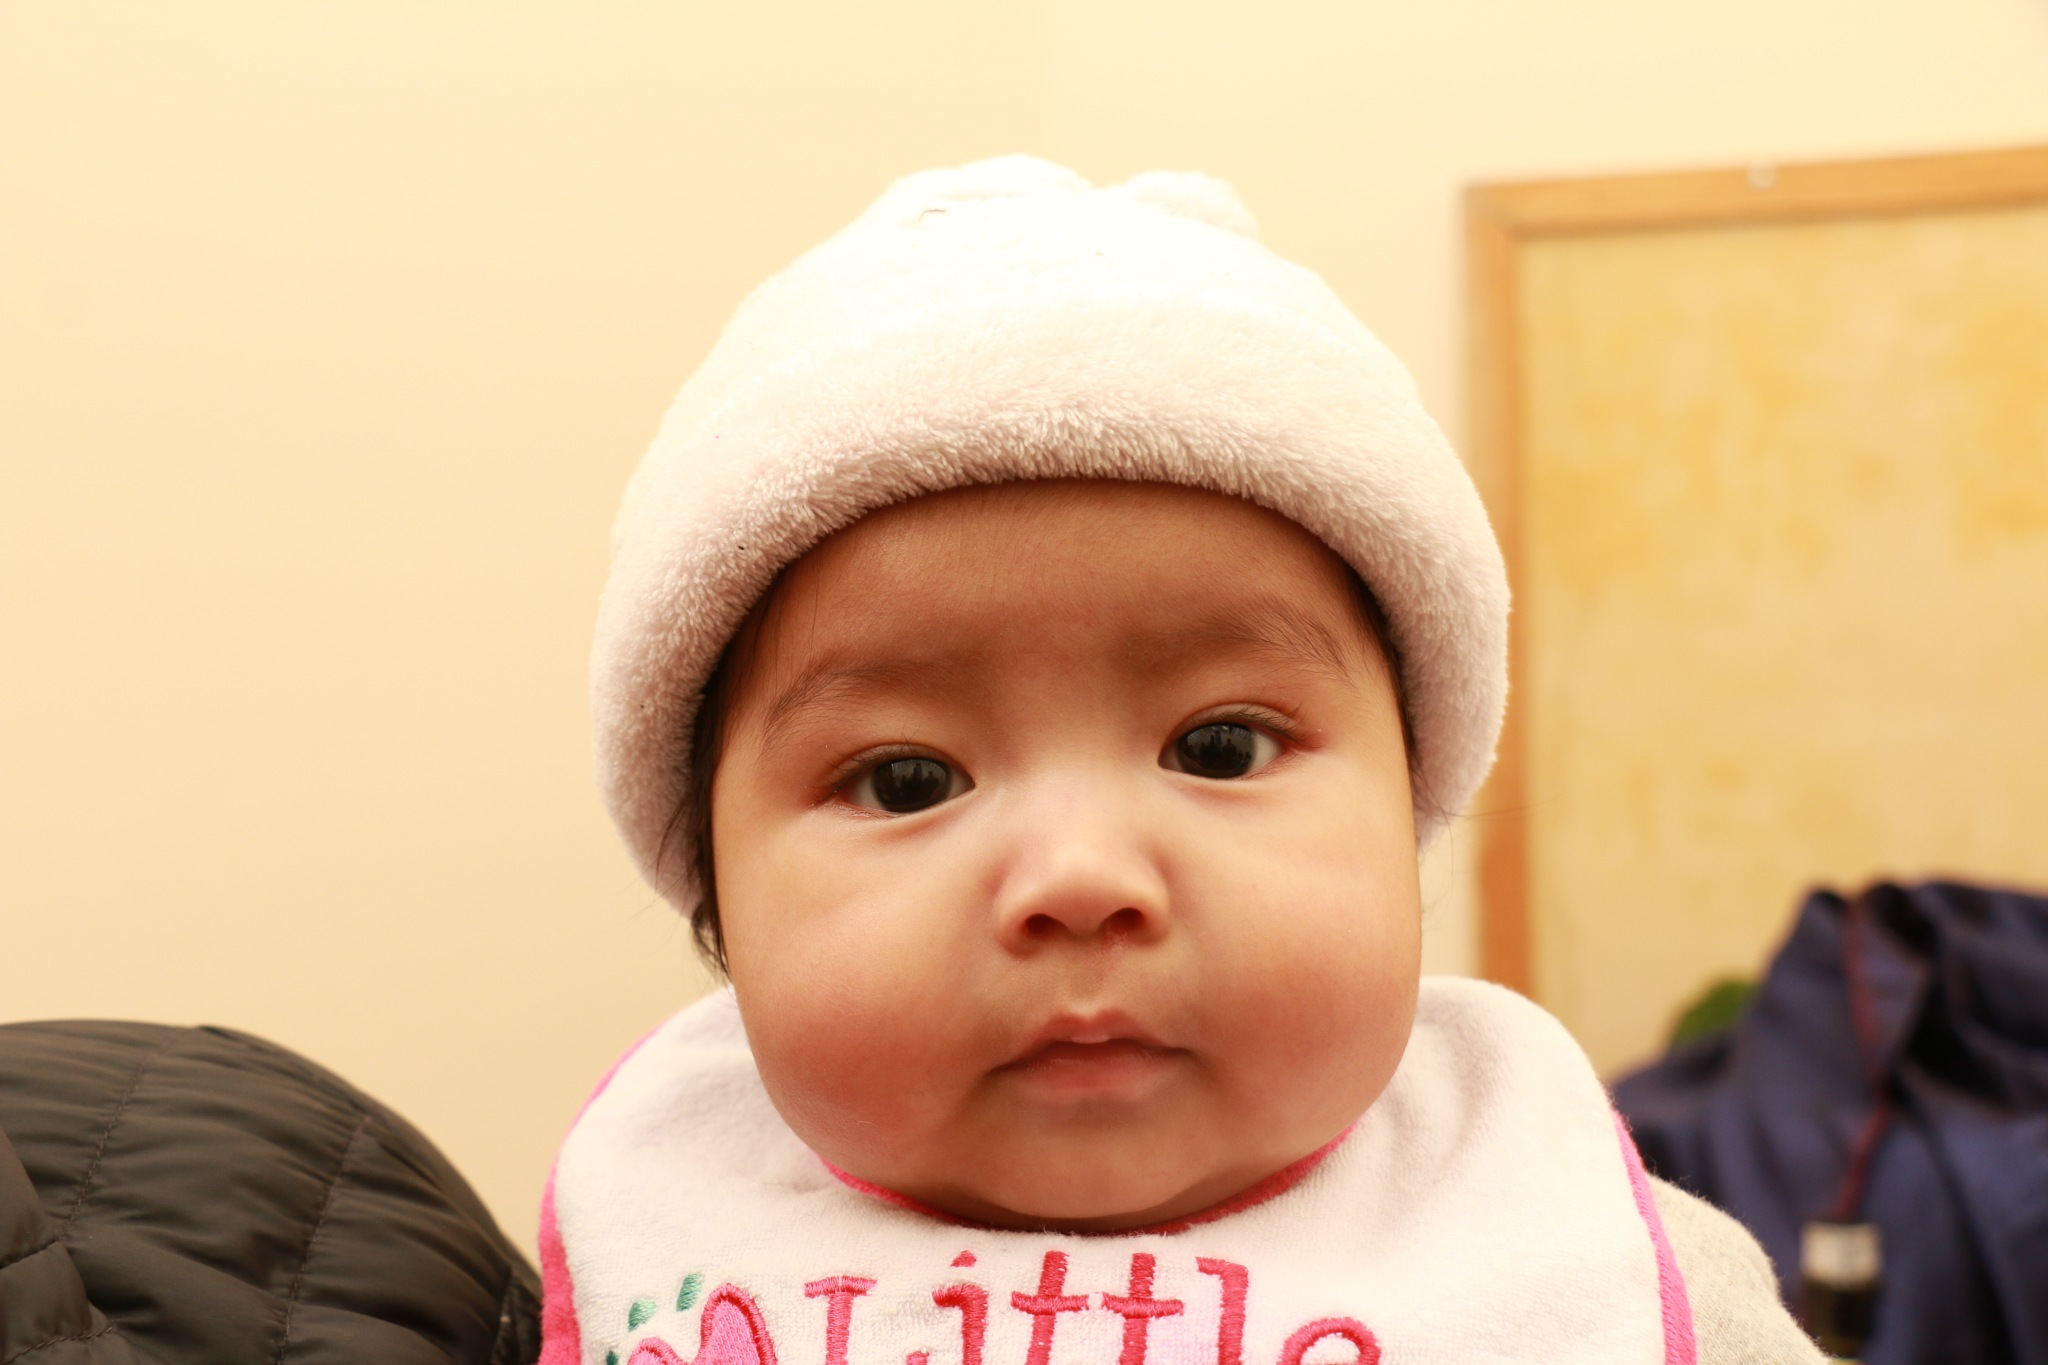 Baby Face. by prterrero92